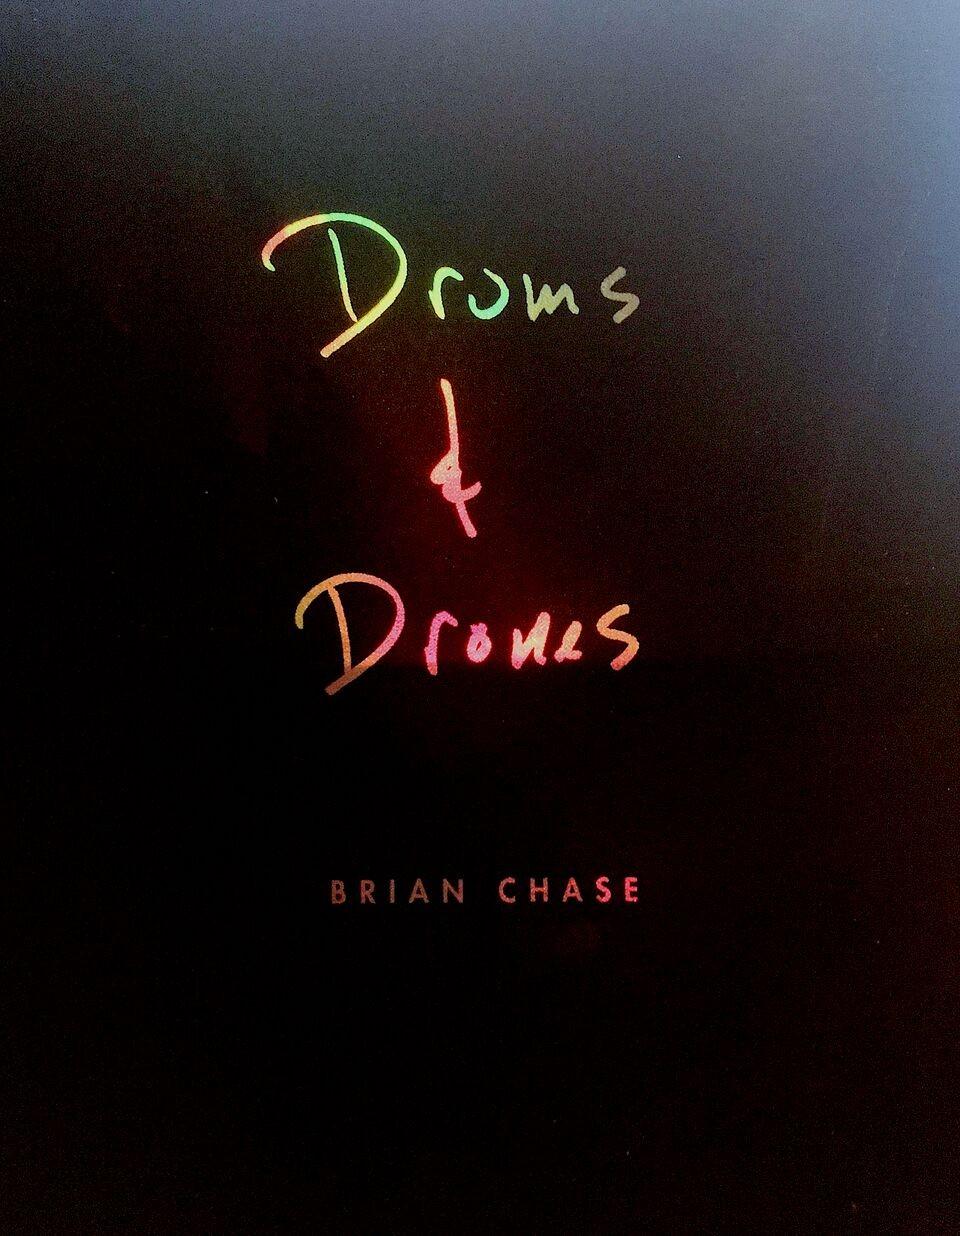 Drums & Drones